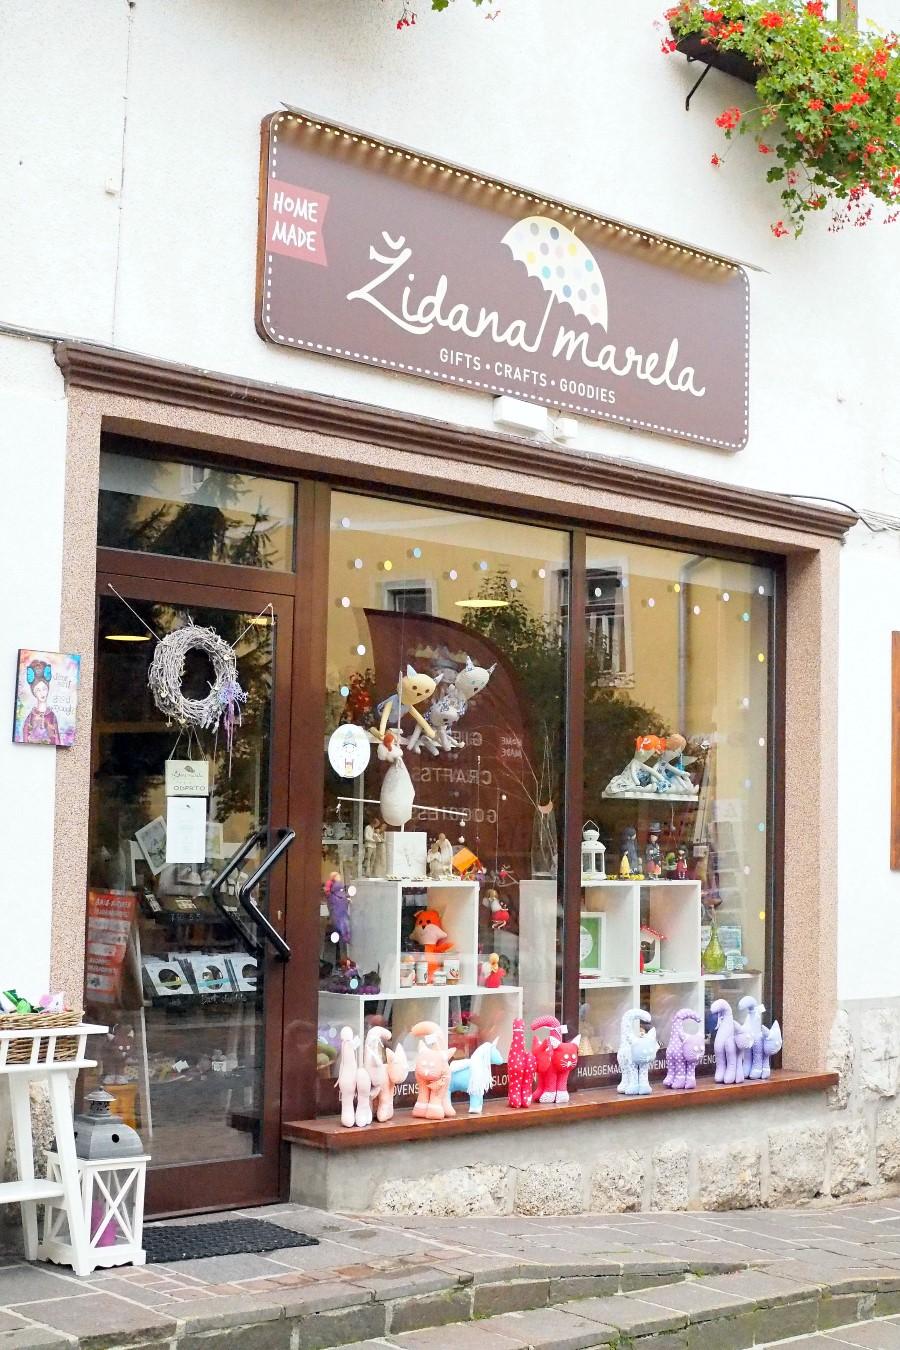 Shop Kranjska Gora